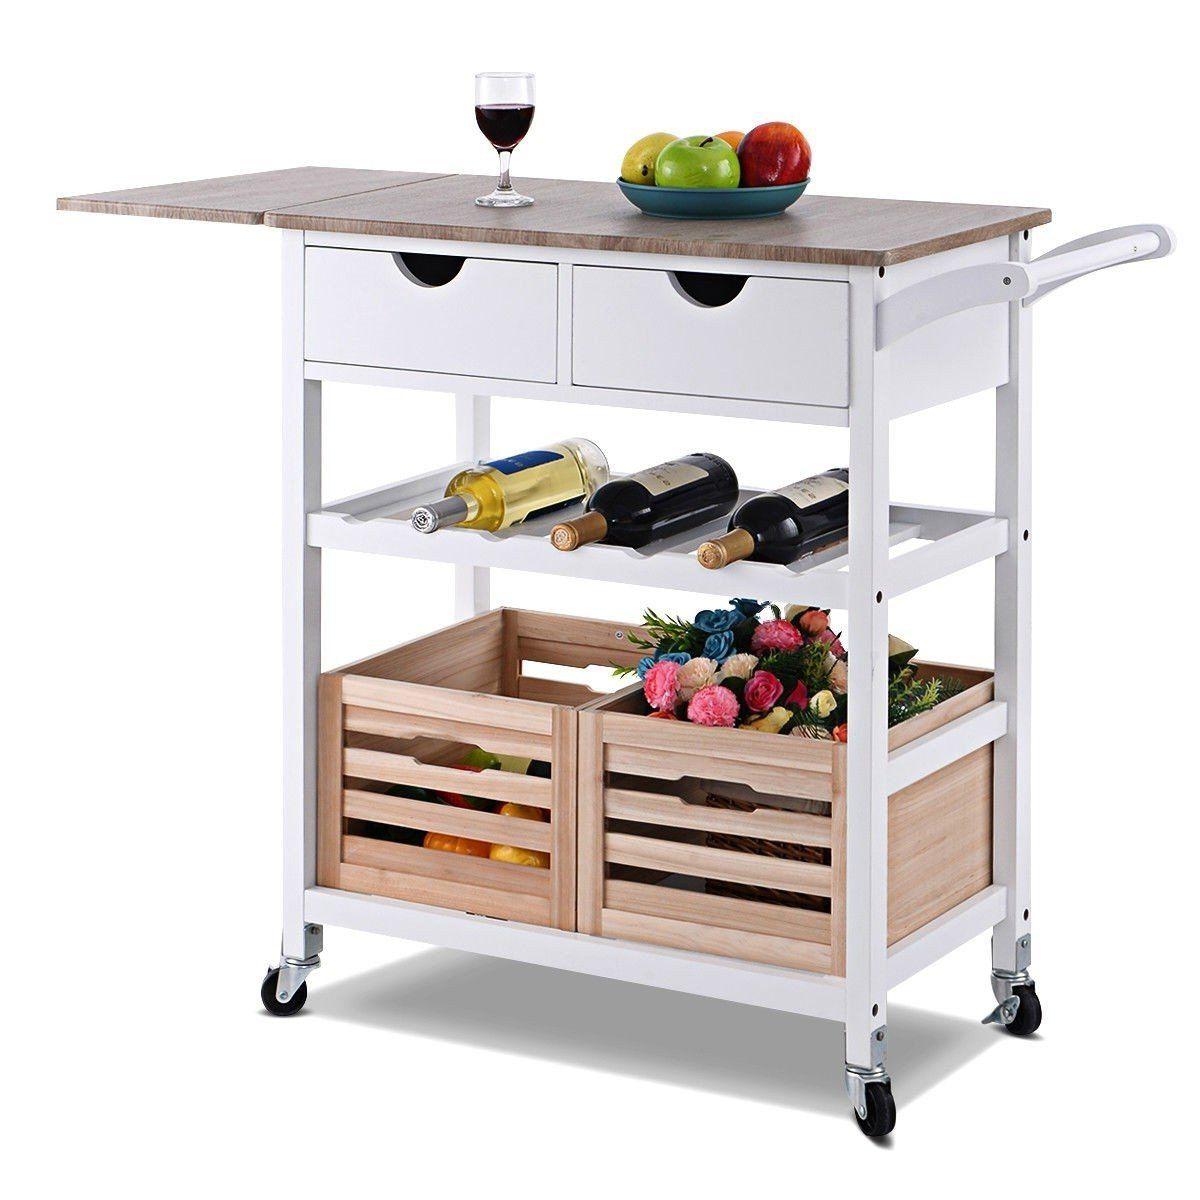 White Wood Kitchen Island Cart With Wine Rack And Wheels In 2020 Rolling Kitchen Island White Wood Kitchens Wood Kitchen Island